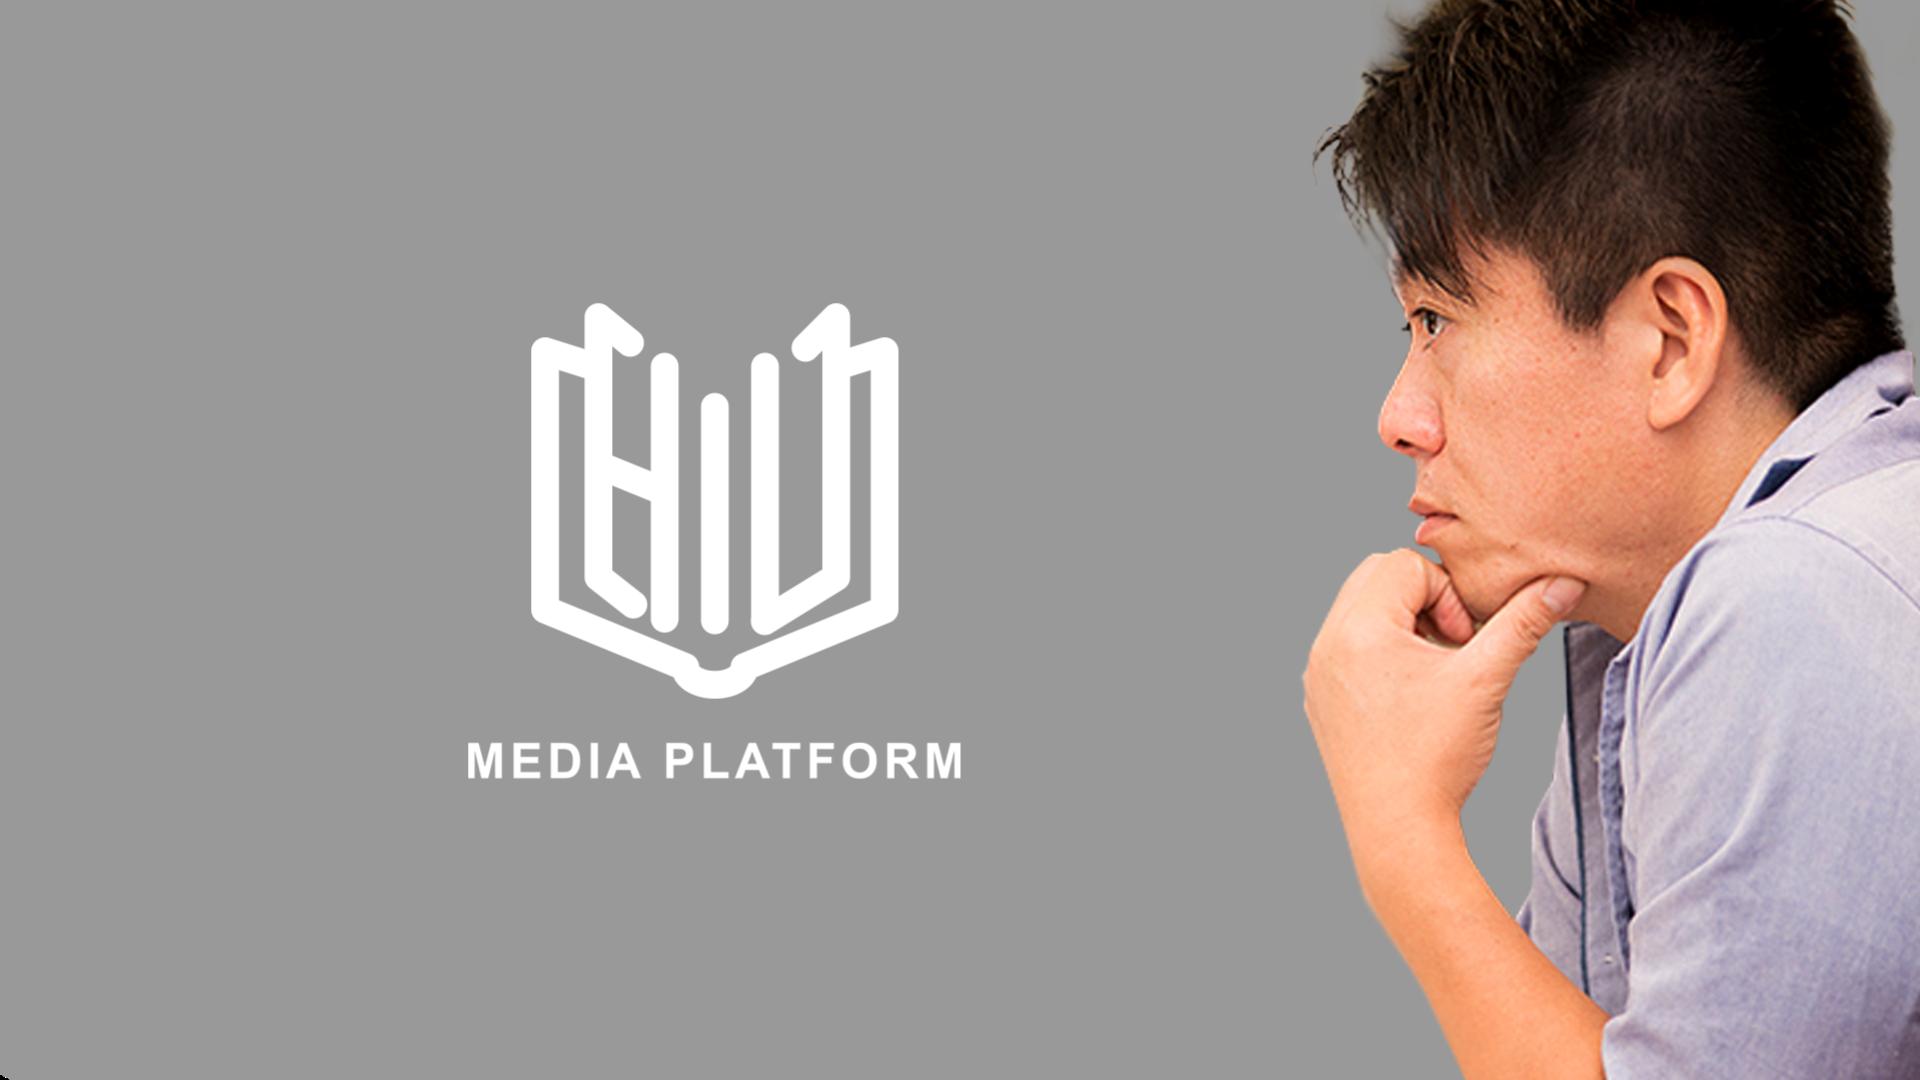 HIUメディアプラットフォーム